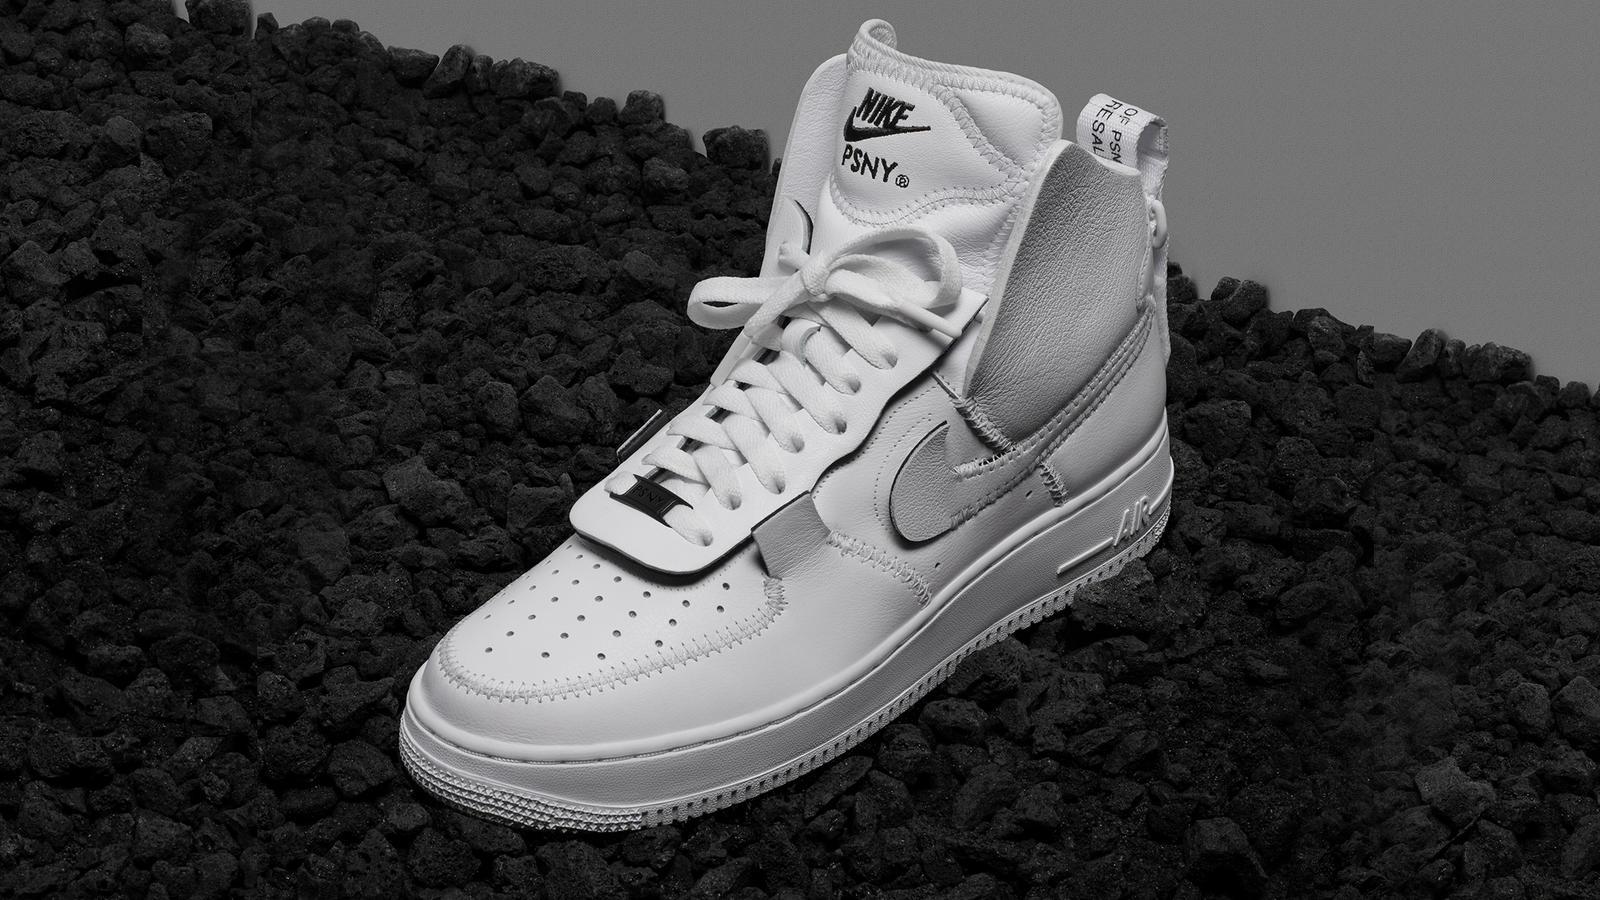 Nike af1 x psny white original hd 1600